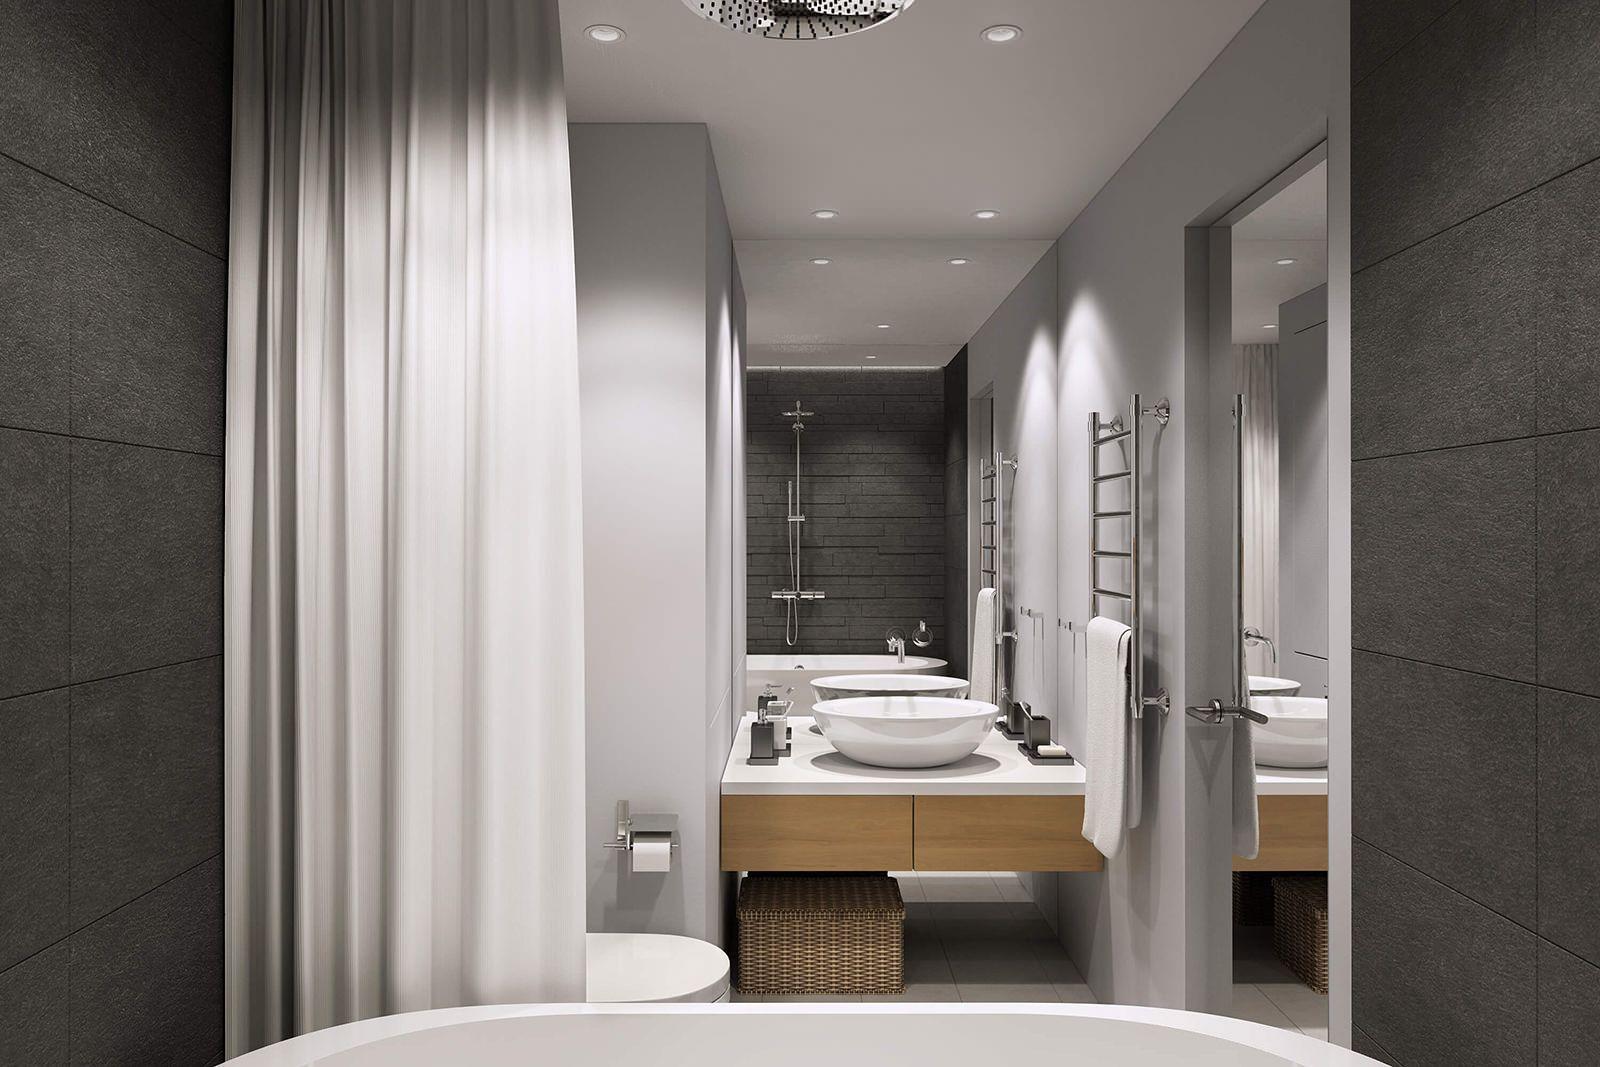 Дизайн ванной комнаты 7 кв.м фото